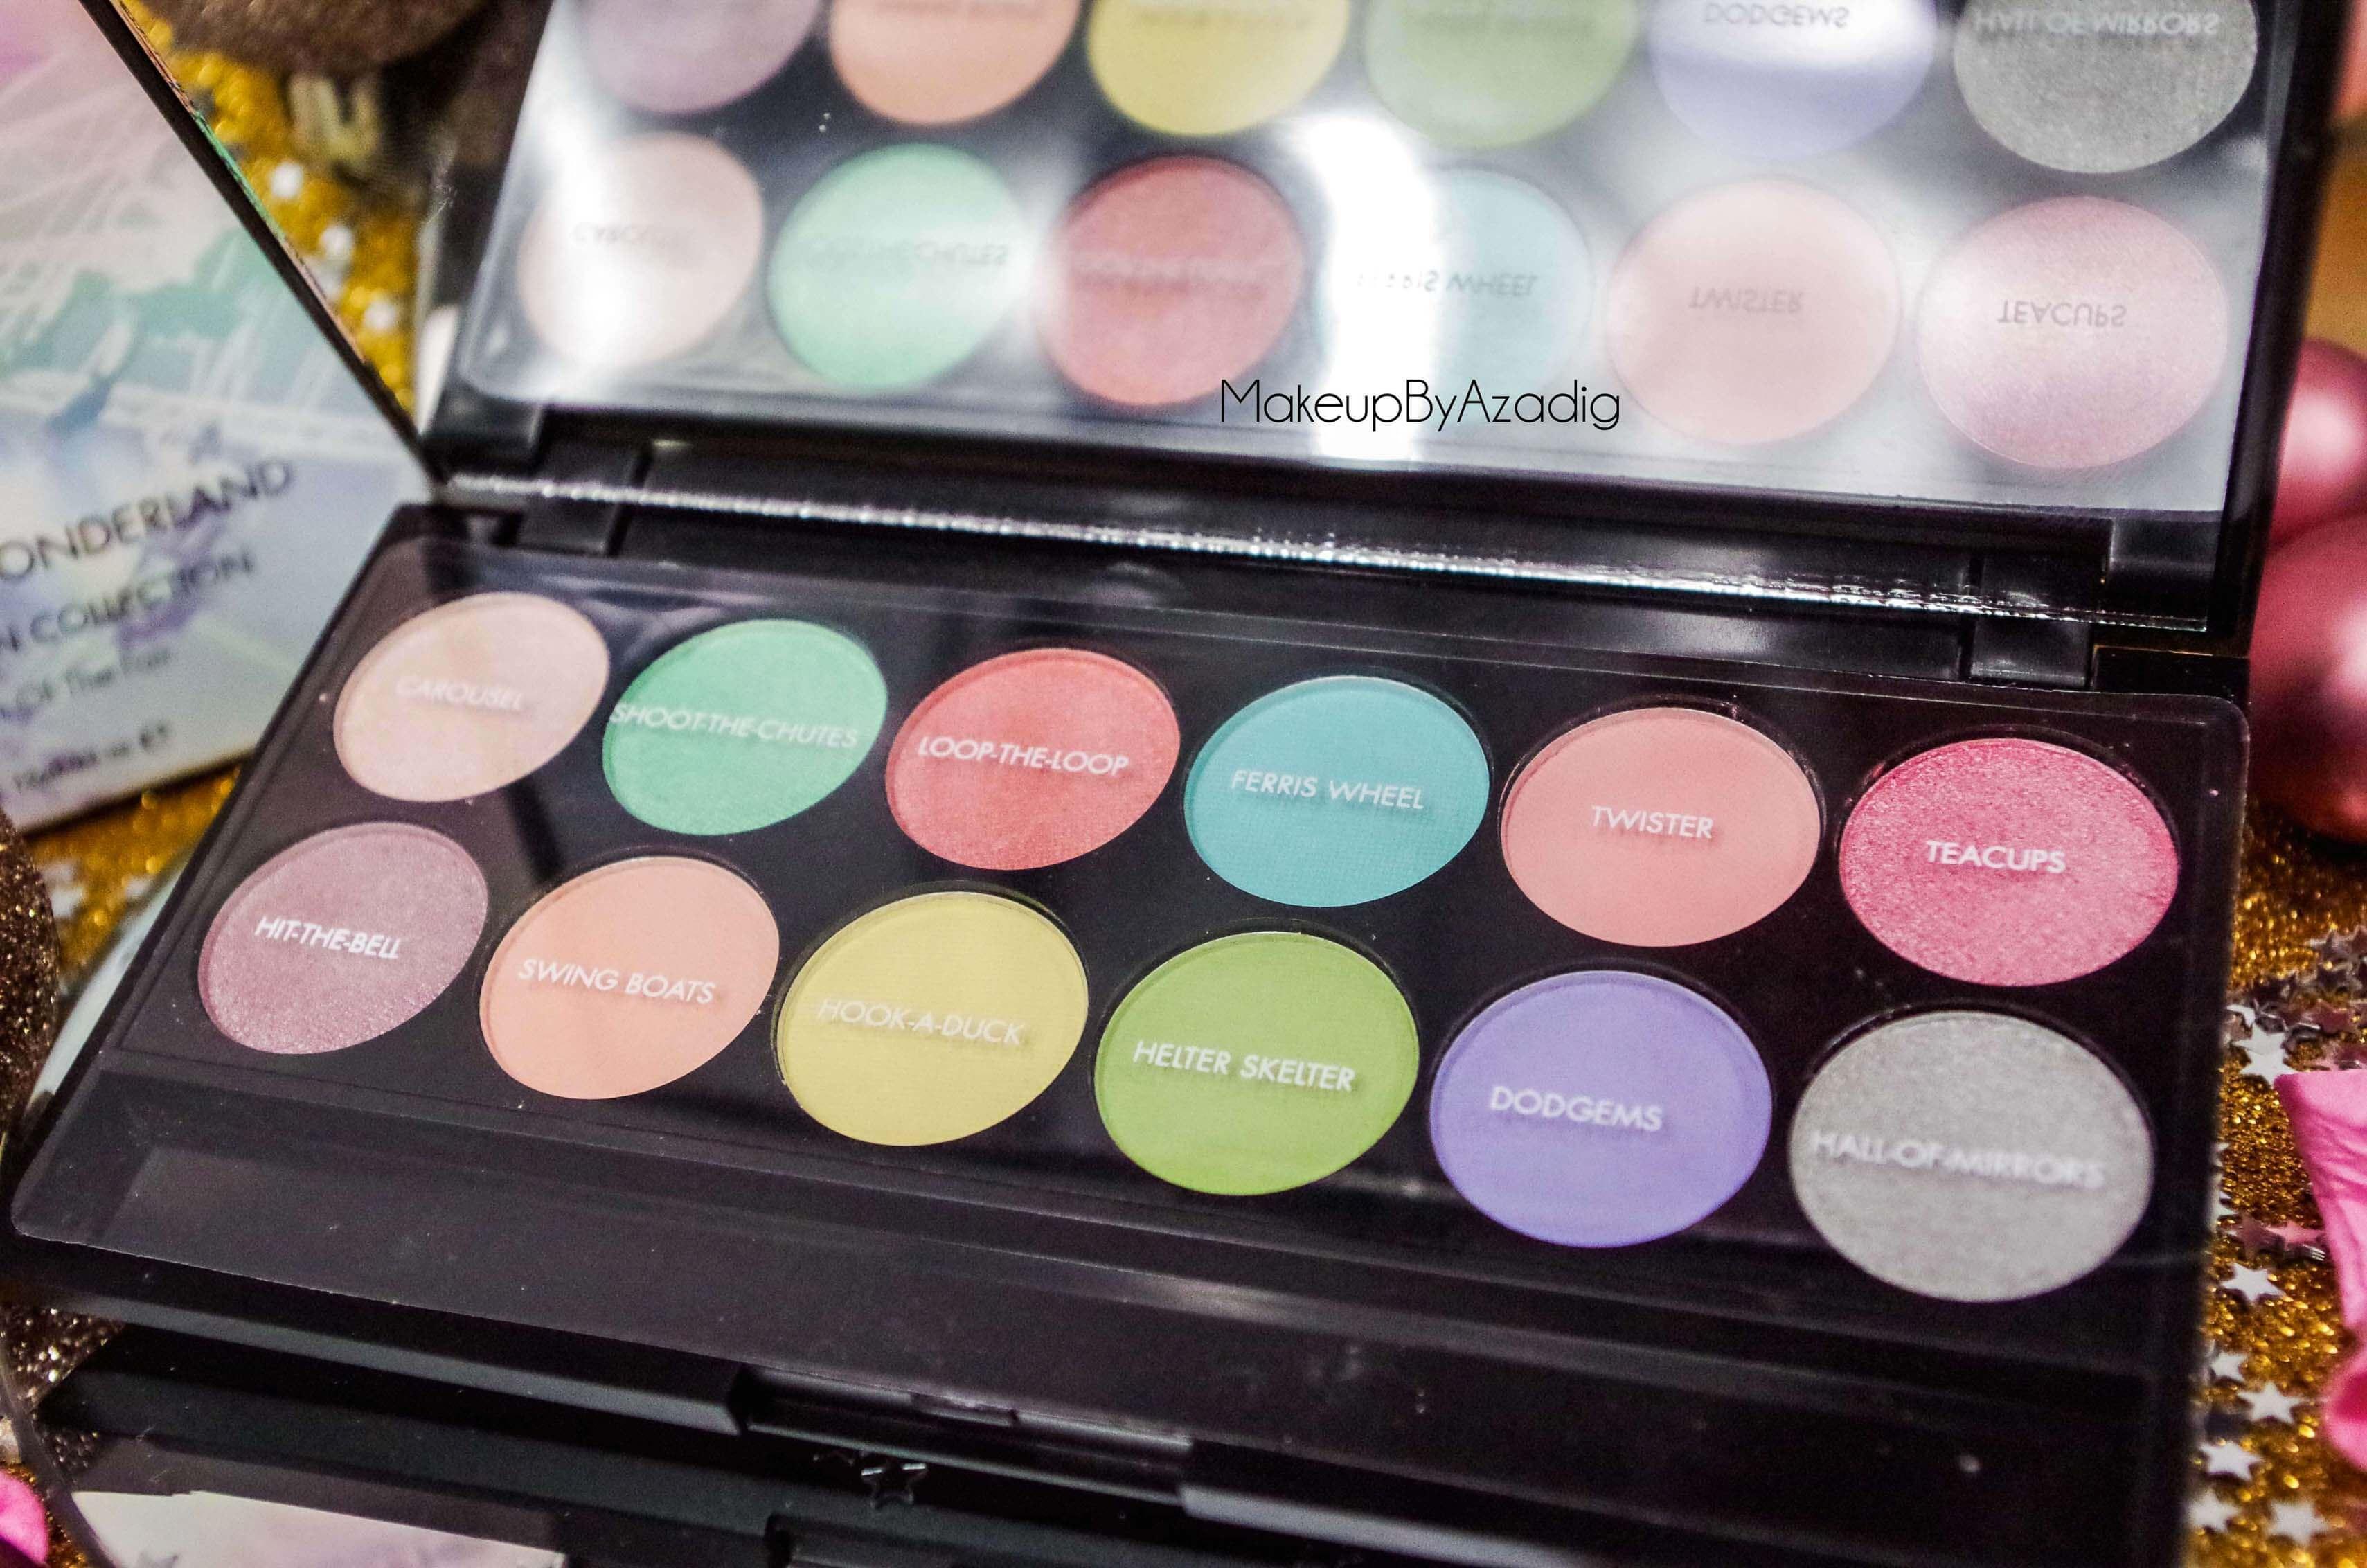 review-palette-sleek-makeup-idivine-pas-cher-sephora-couleurs-allthefunofthefair-code-promo-sephora-paris-makeupbyazadig-printemps-tendance-2